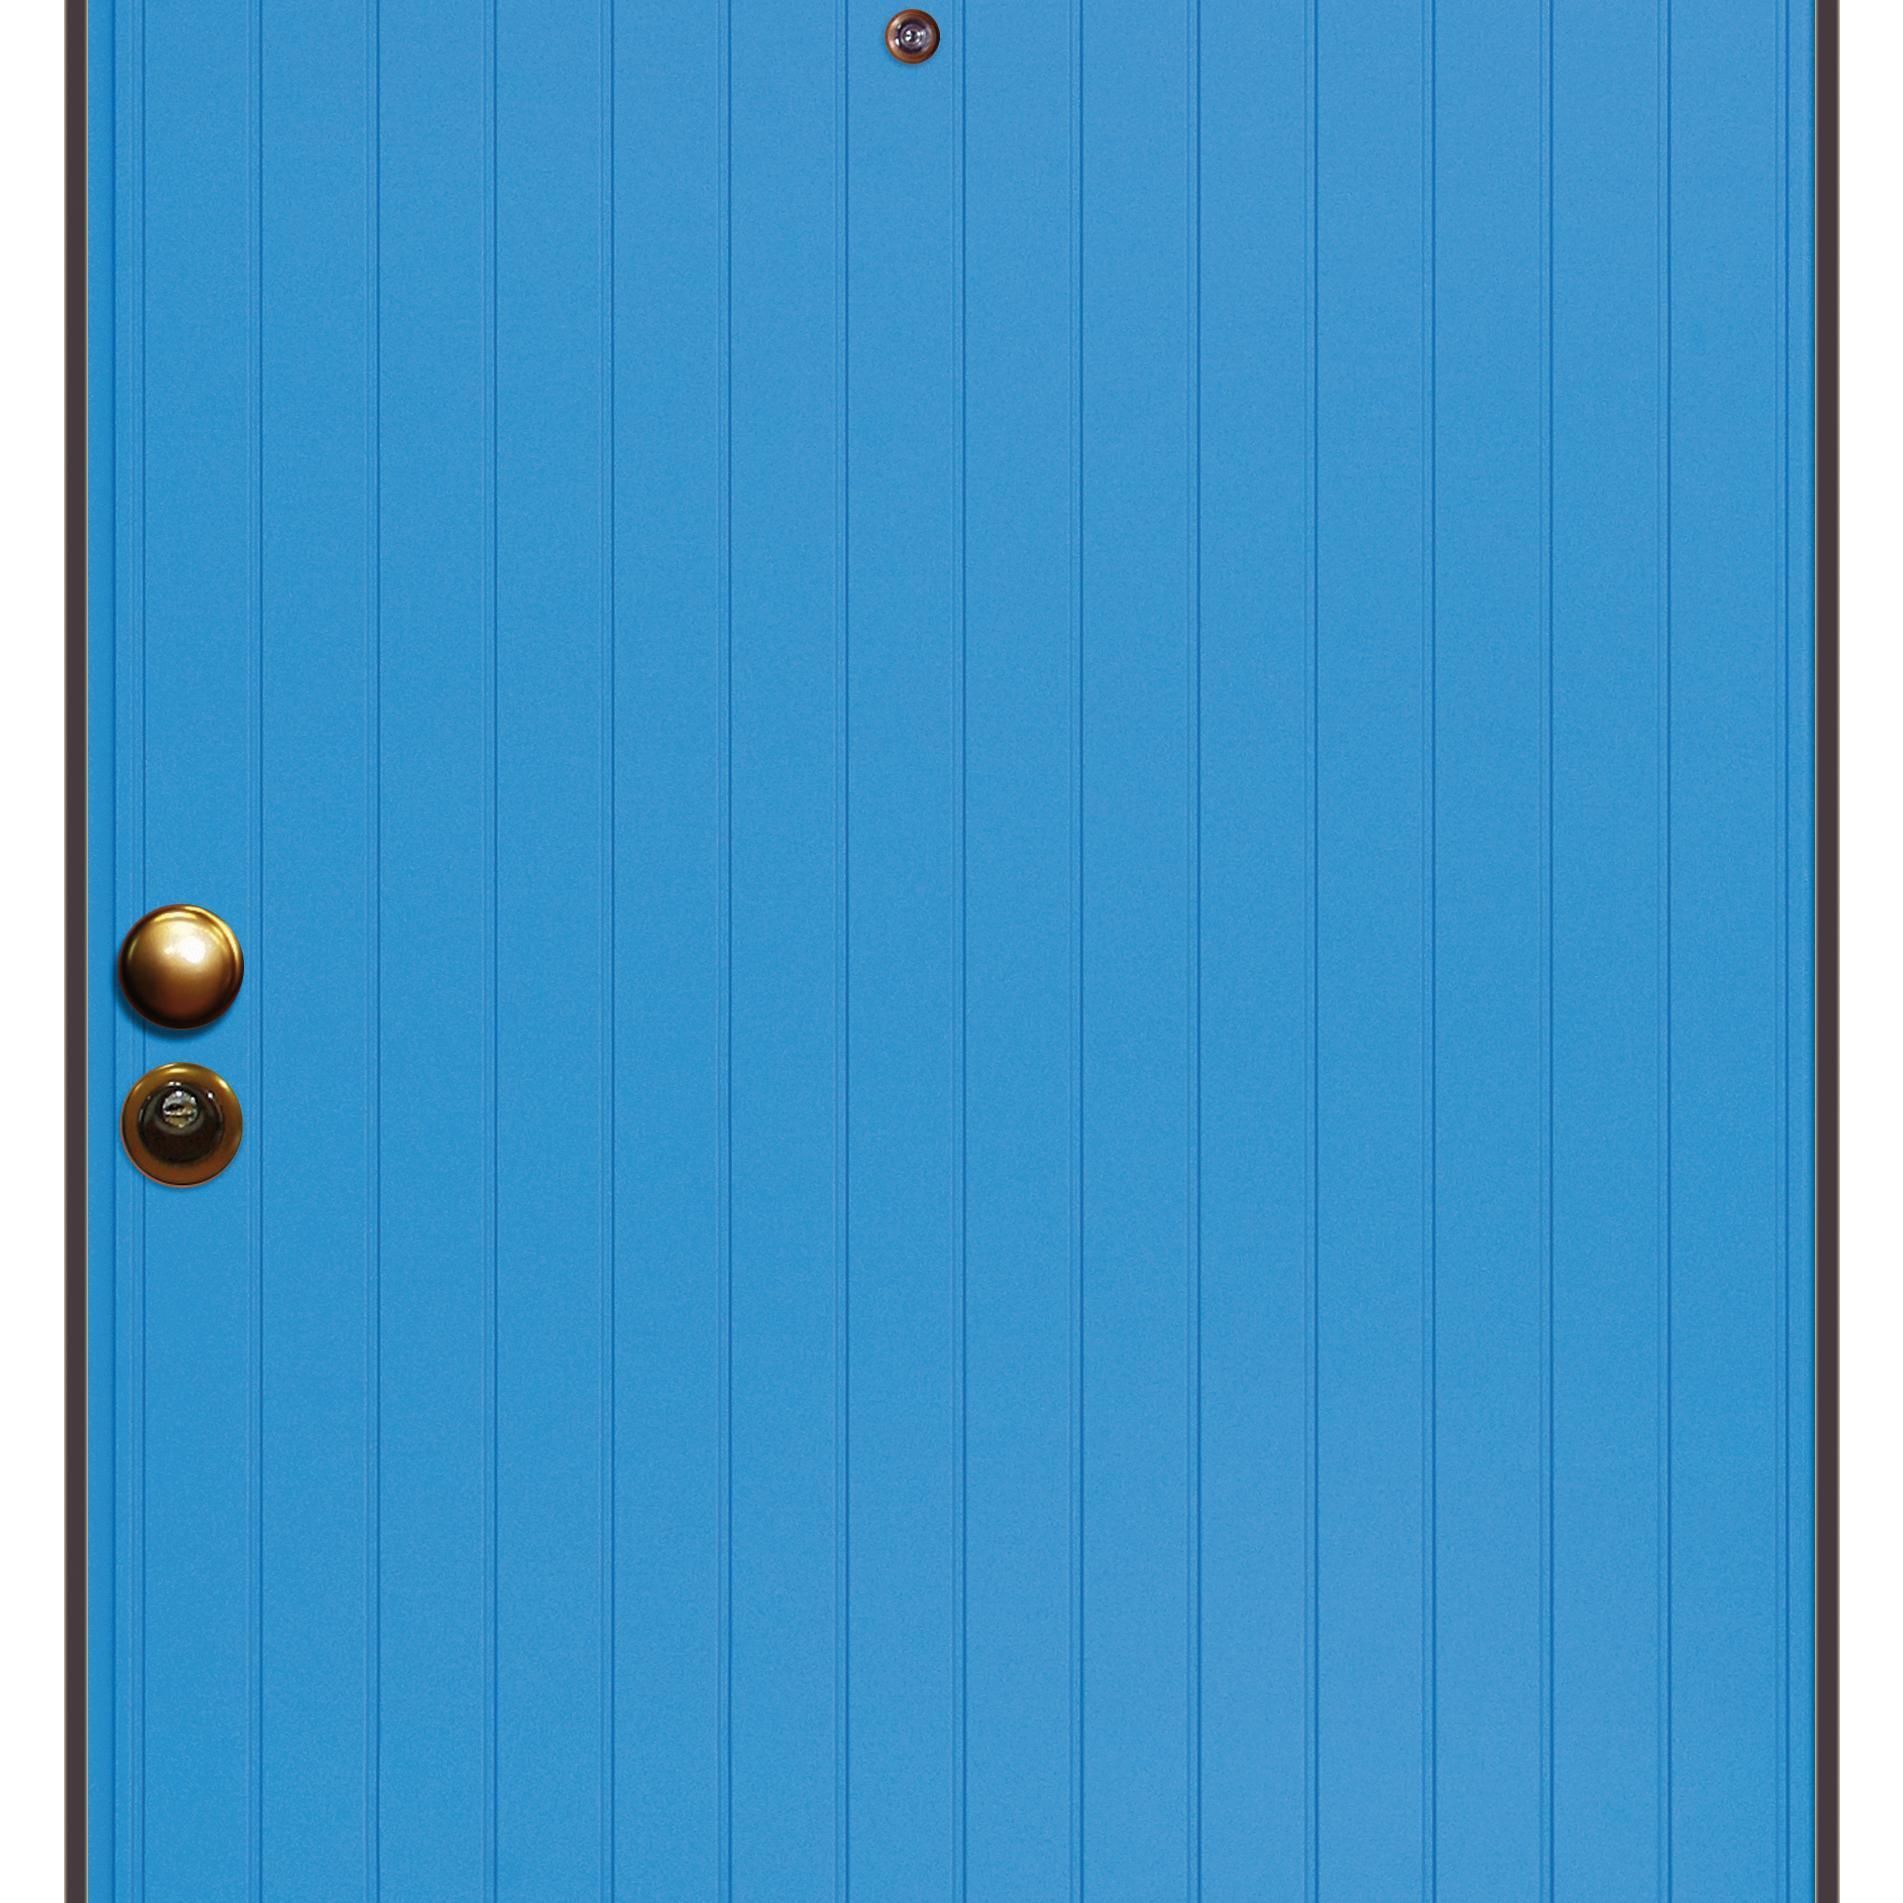 Porta blindata Grecia azzurro L 90 x H 210 cm destra - 2